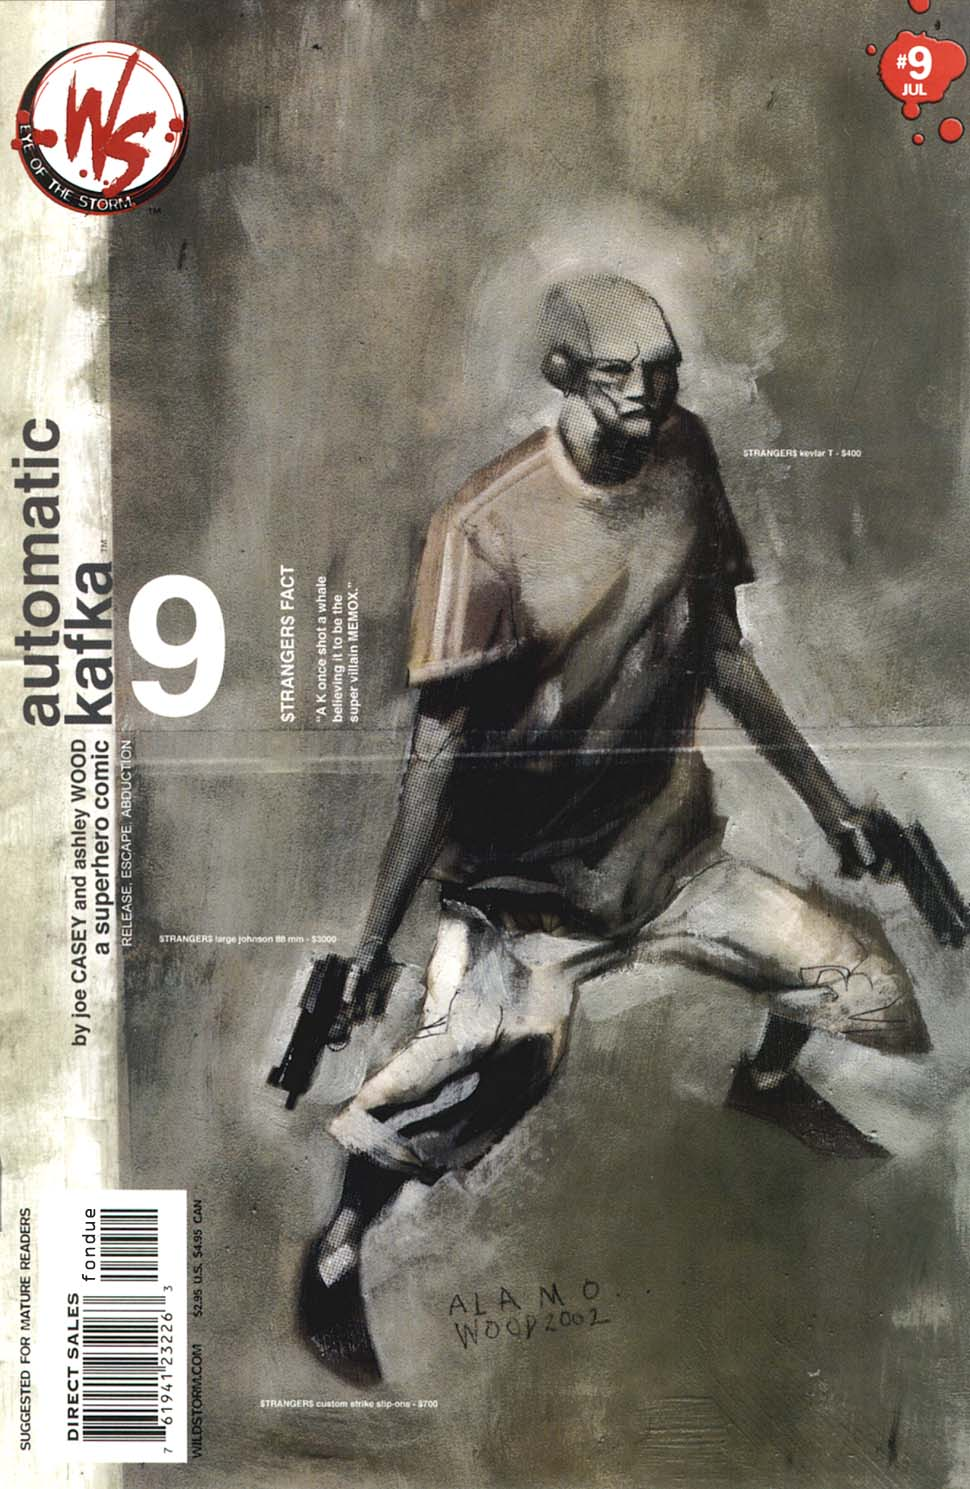 Read online Automatic Kafka comic -  Issue #9 - 1